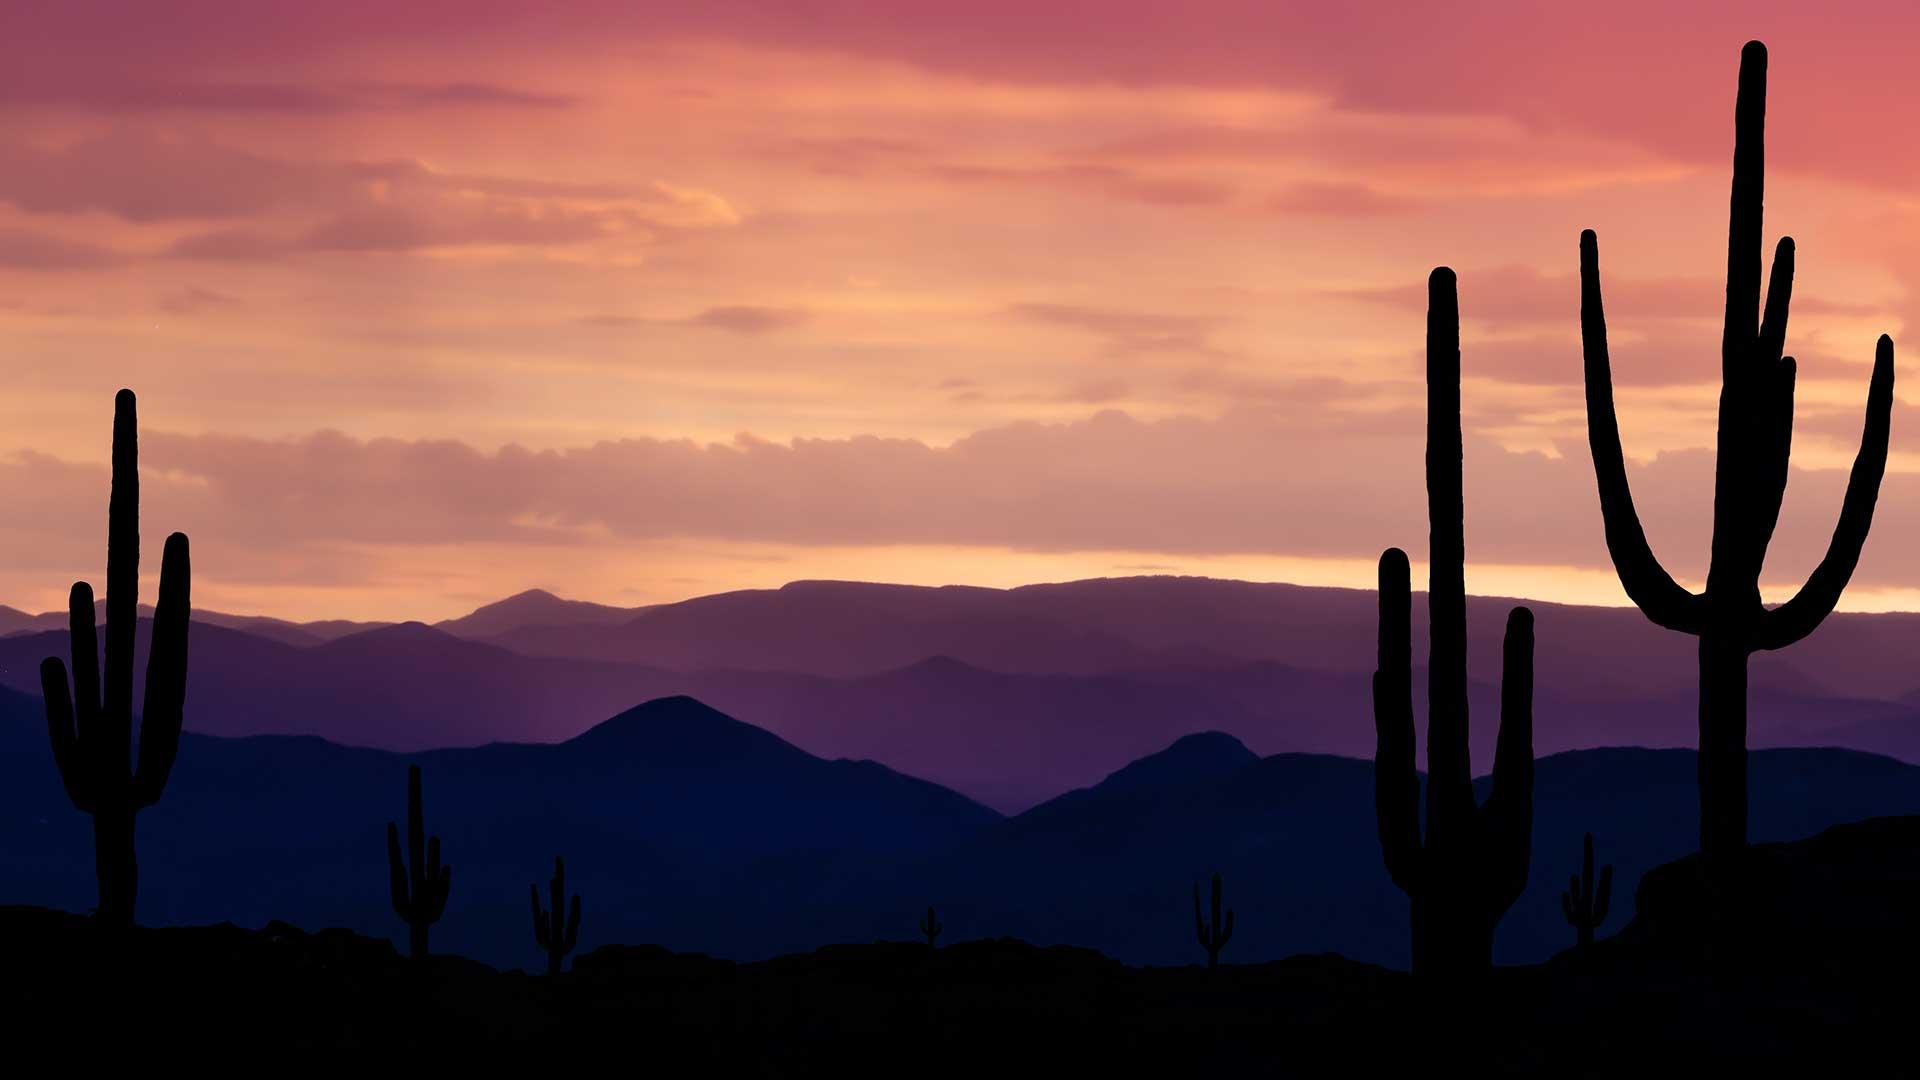 Panorama to illustrate dating in Arizona